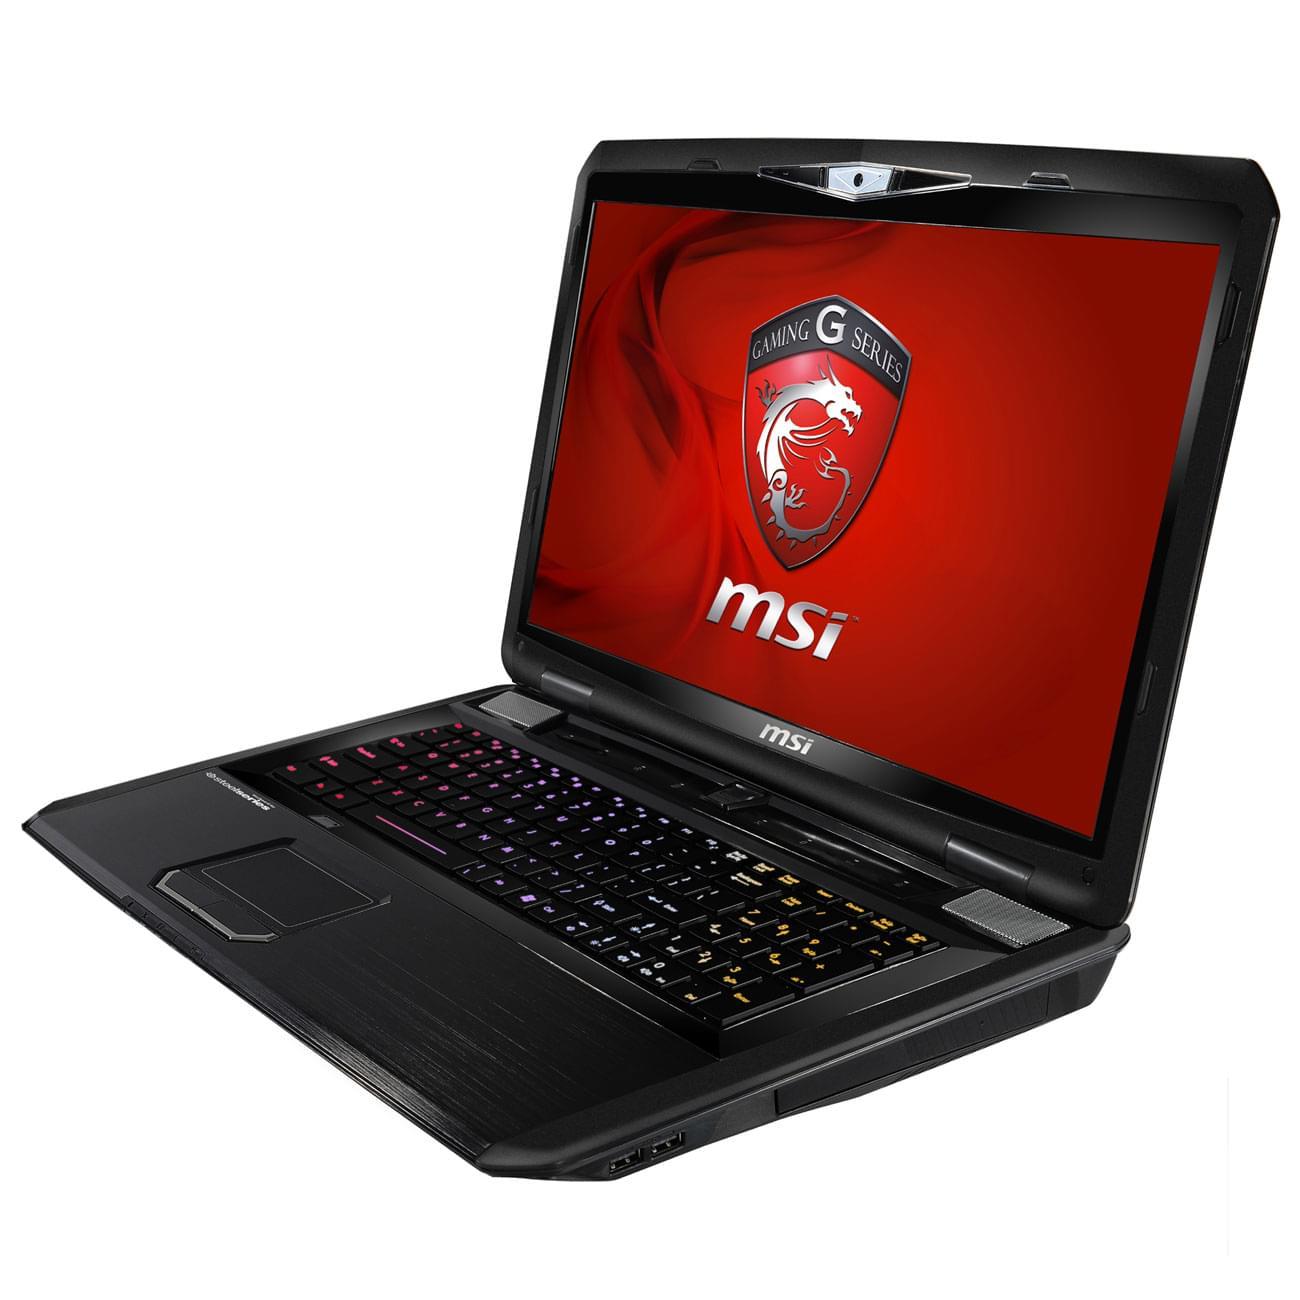 MSI GT70 2OC-430XFR - PC portable MSI - Cybertek.fr - 0